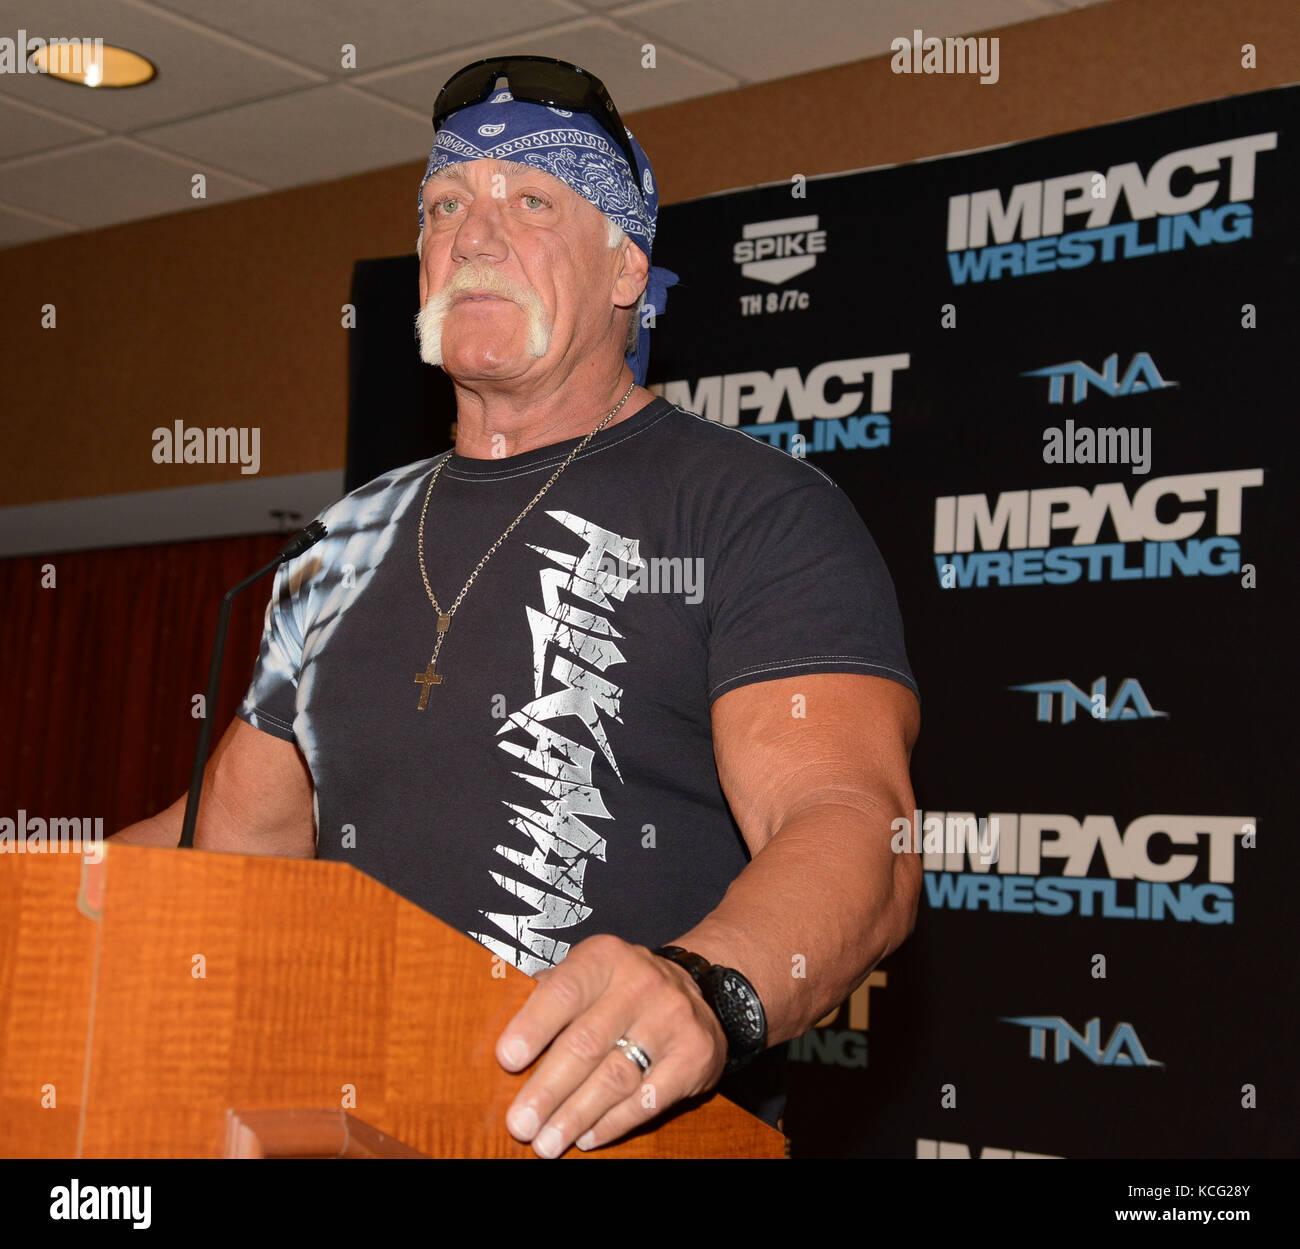 LAS VEGAS, NV - May 15: Hulk Hogan Helps Welcome TNA Impact Wrestling to